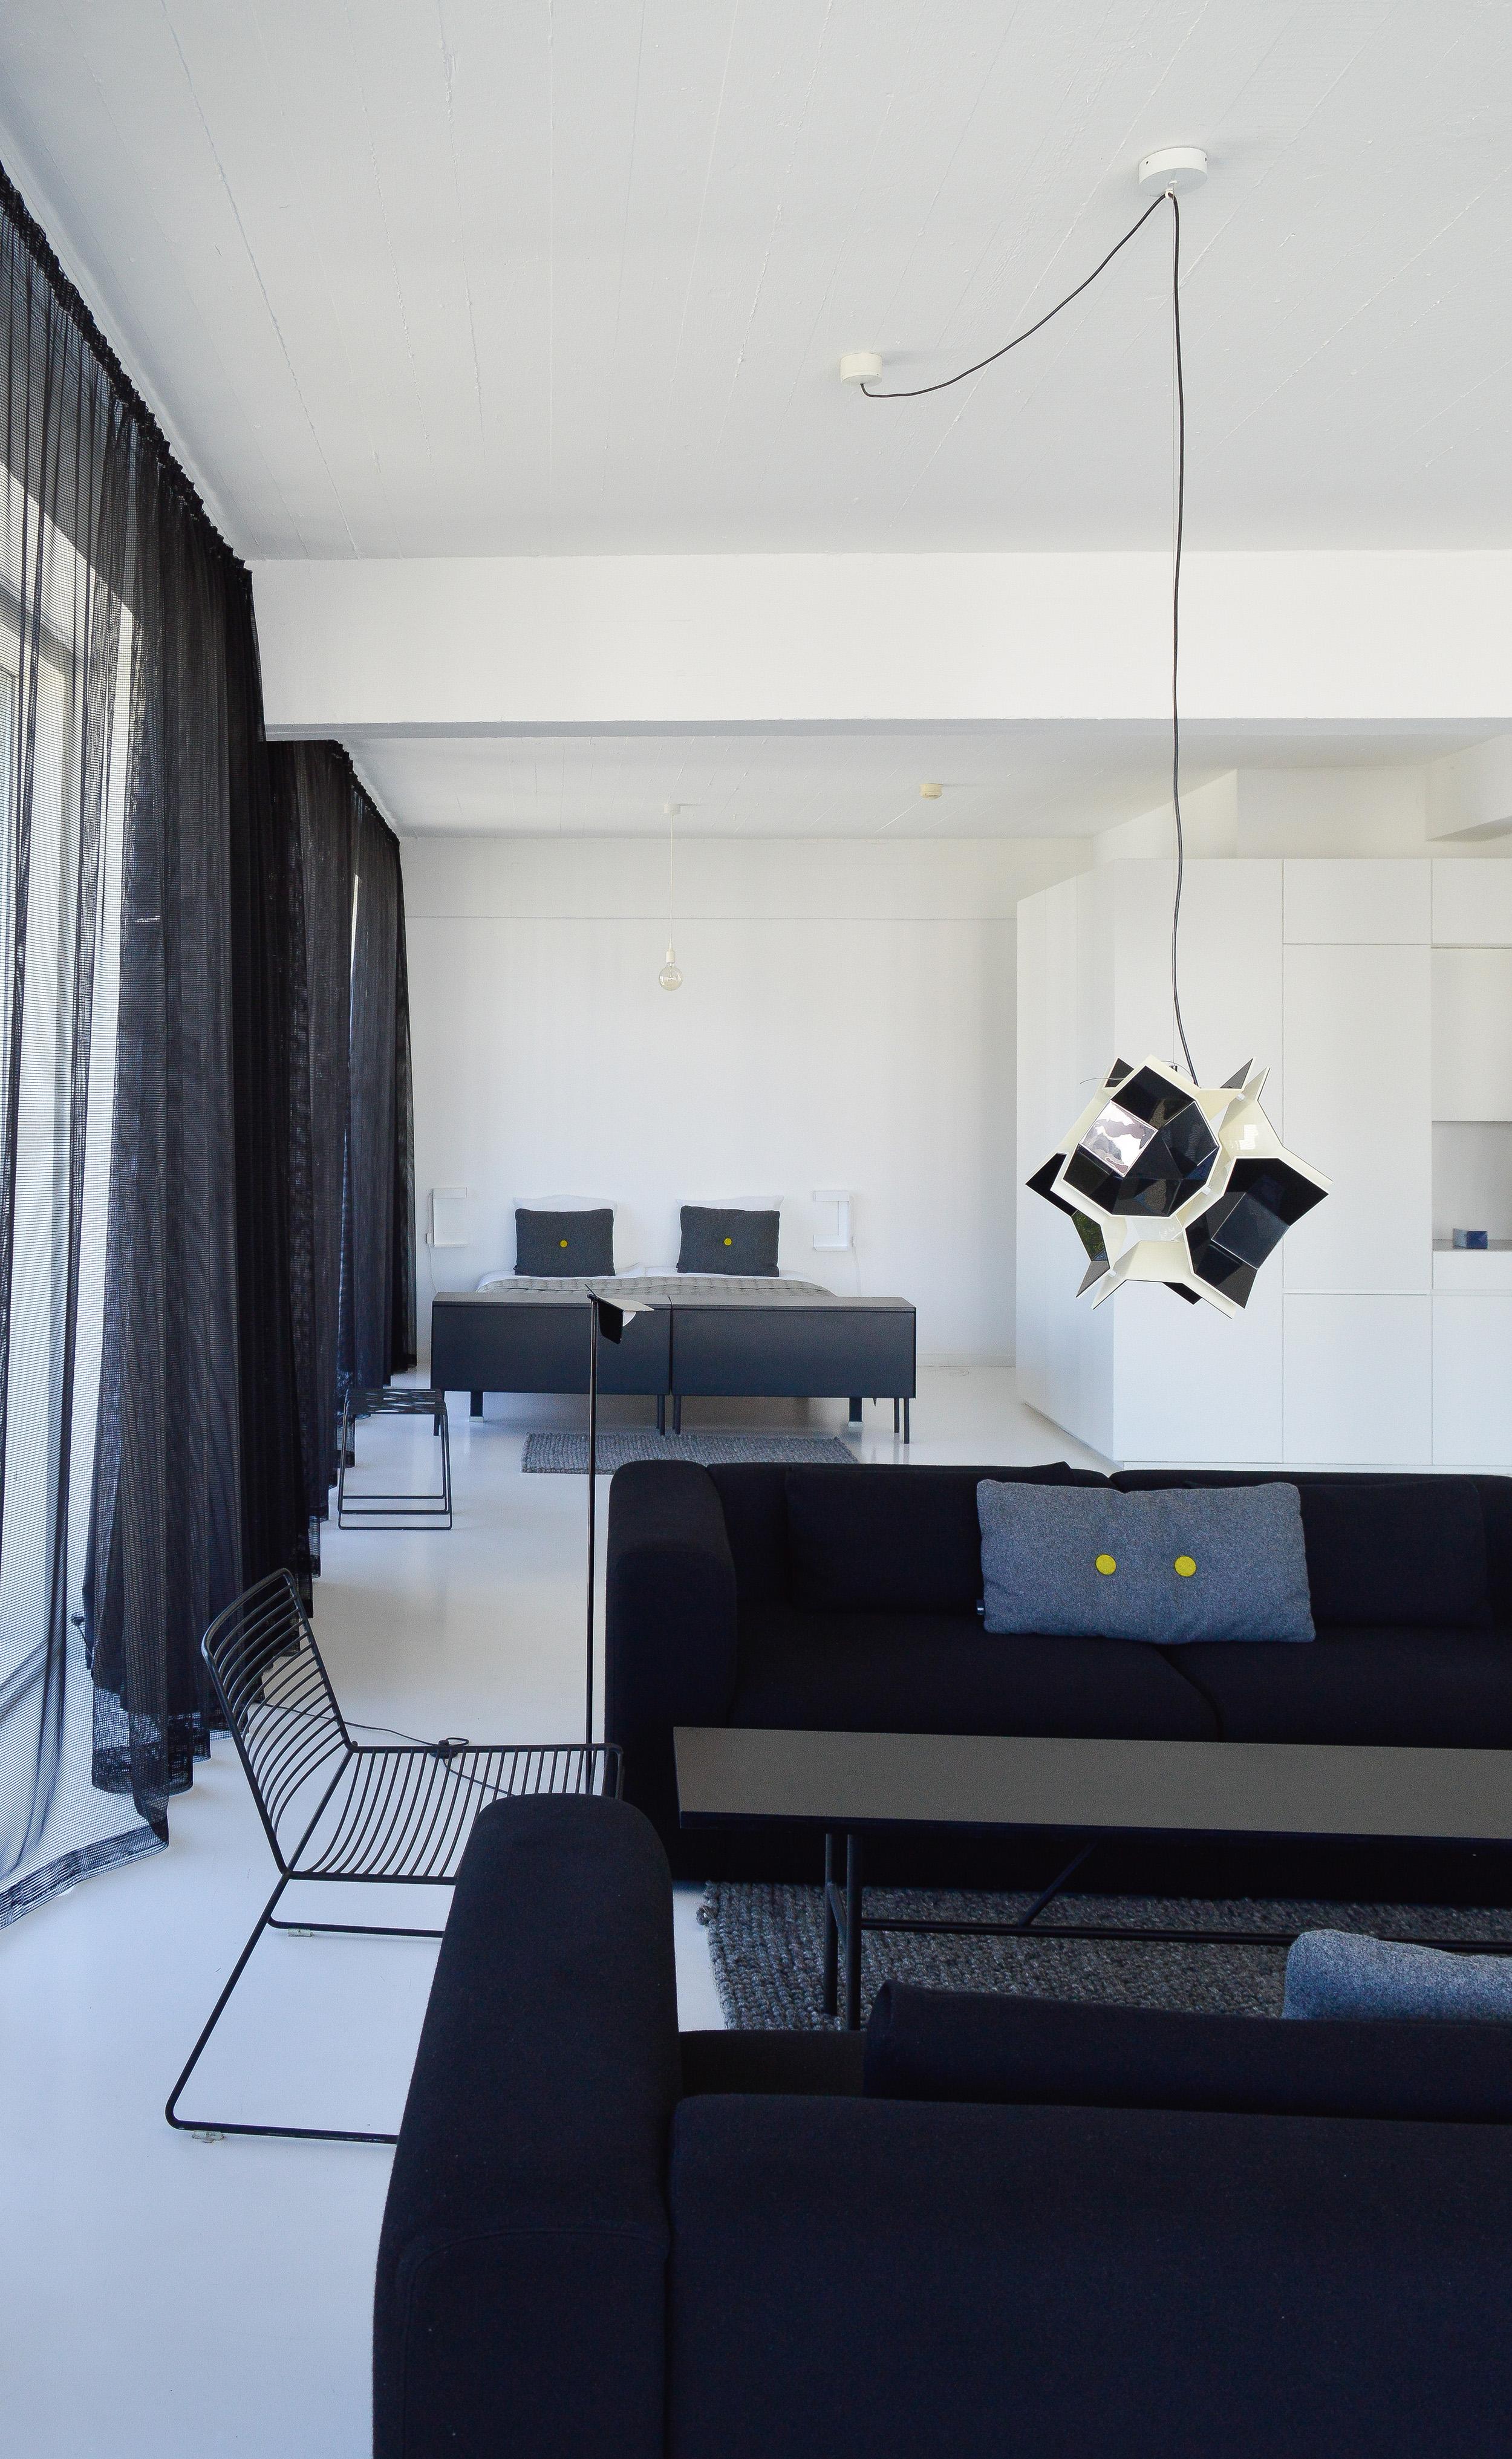 A Scandinavian minimalist apartment